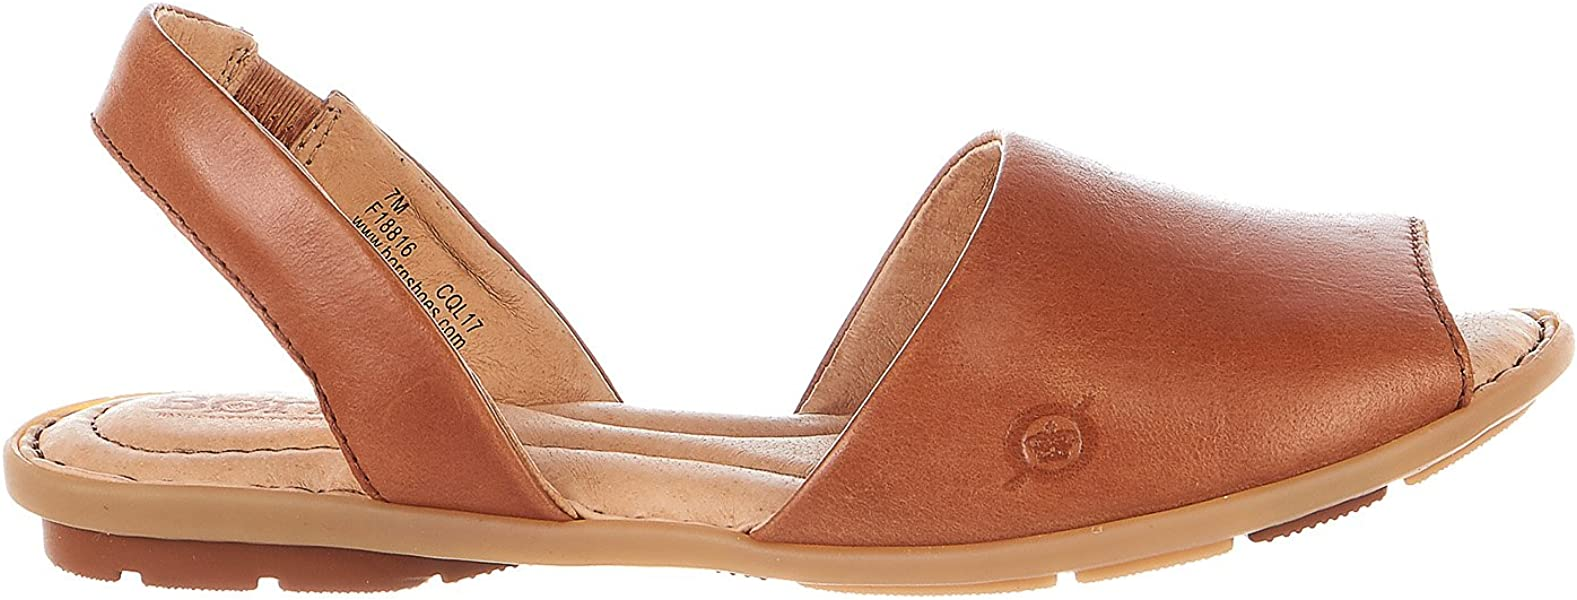 ff655b035 Trang Tan Full Grain Leather Women s Shoes